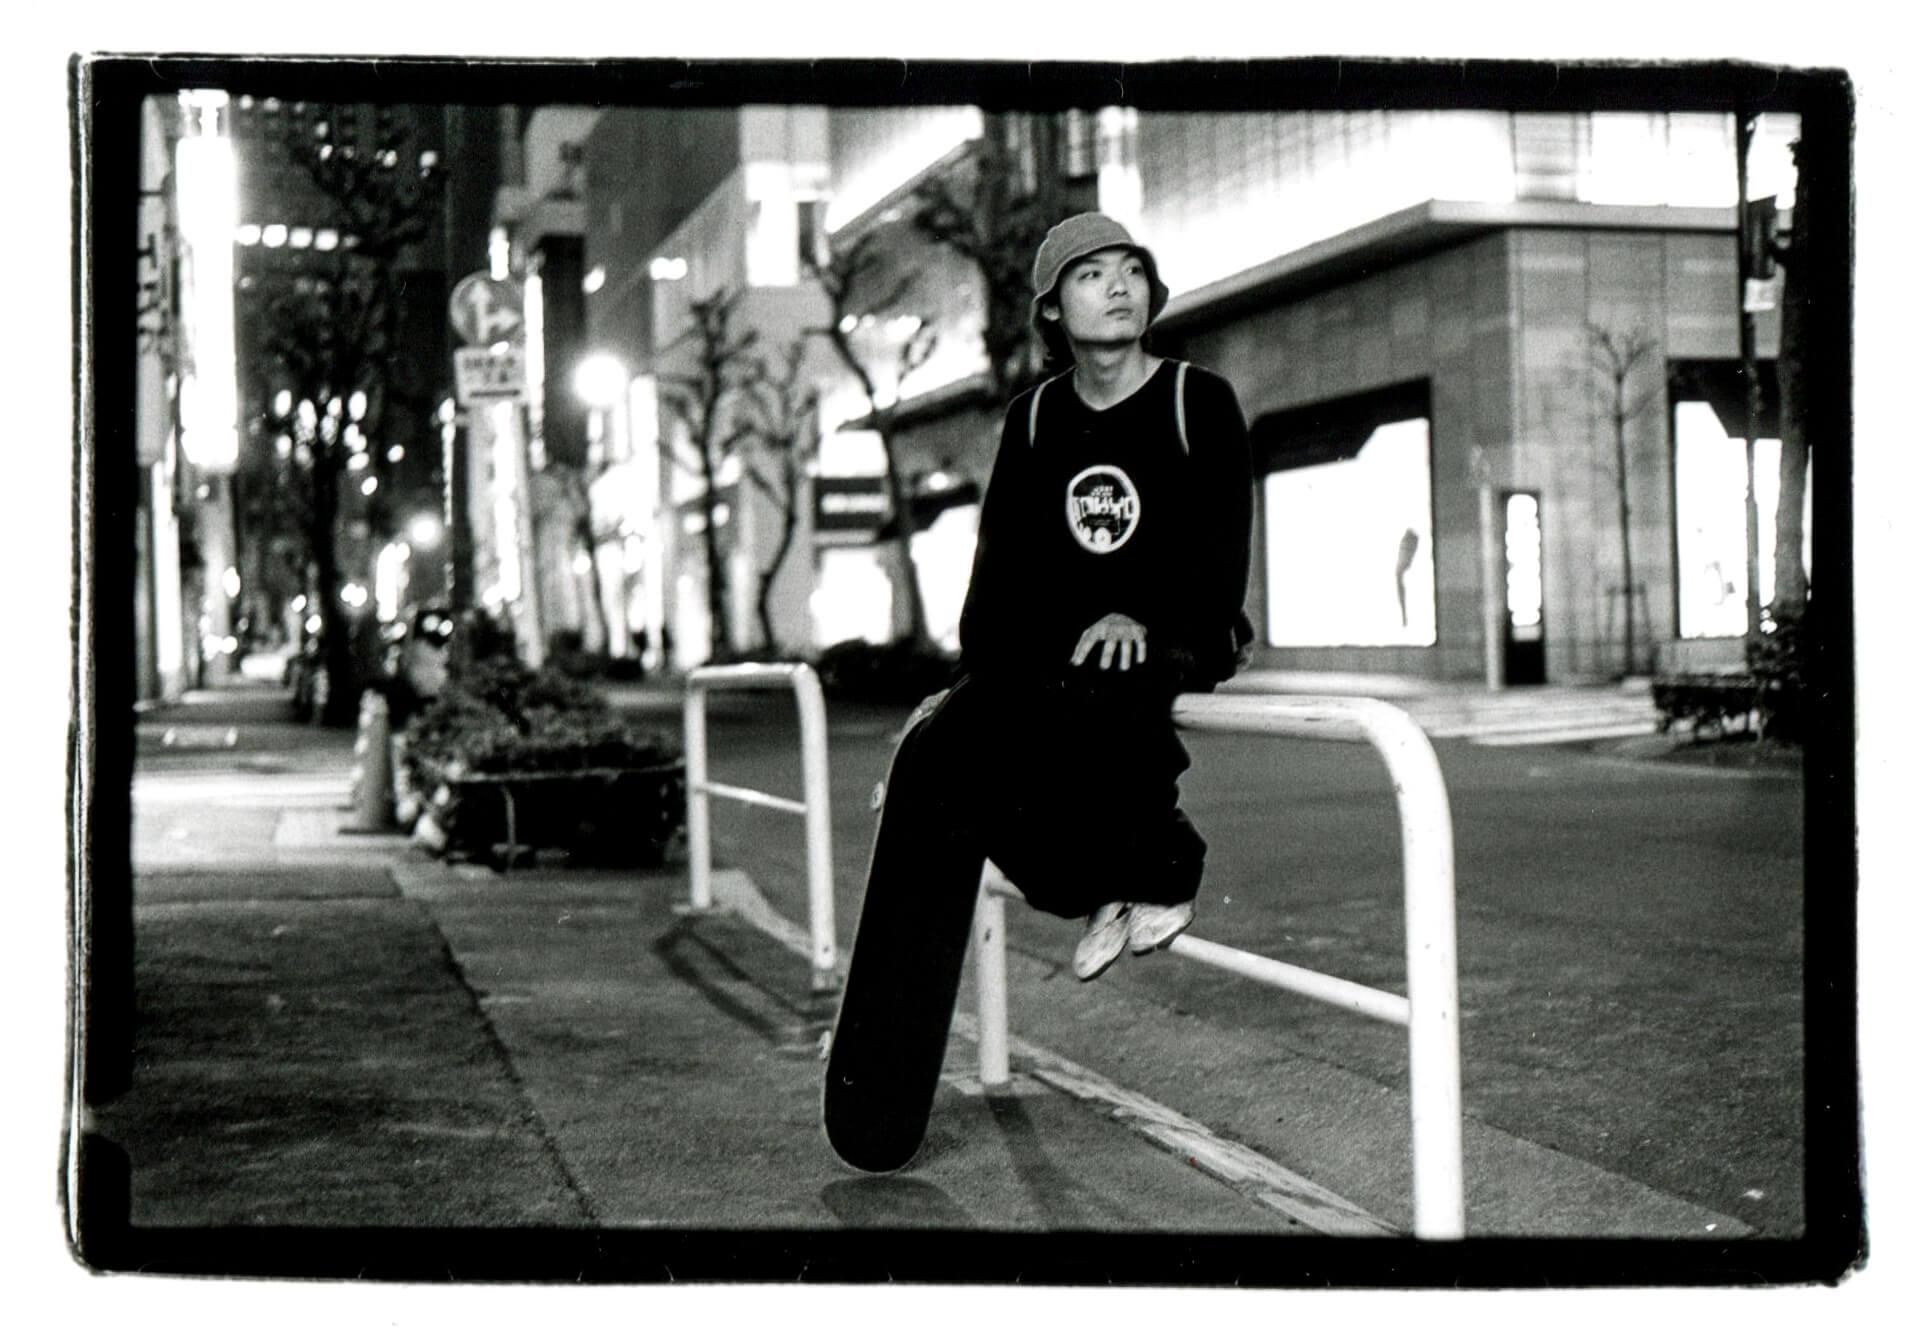 Naoya Kato(加藤直哉)カリフォルニアストリート ライダー加入